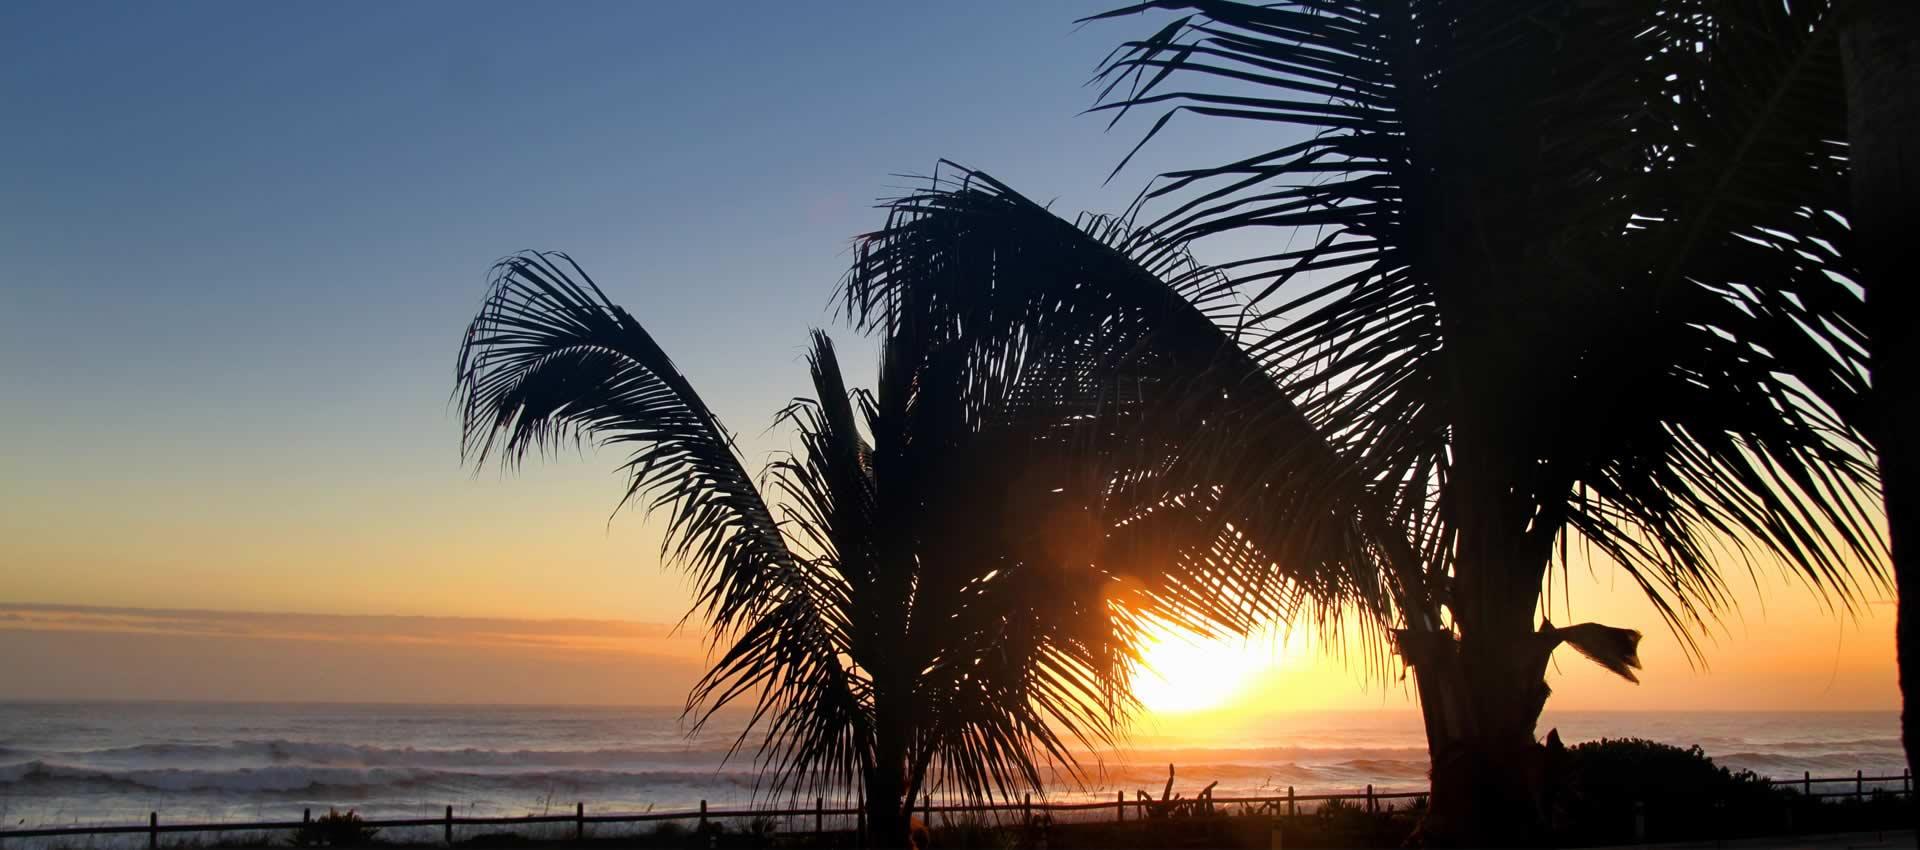 Oceanfront-cottages-sunset